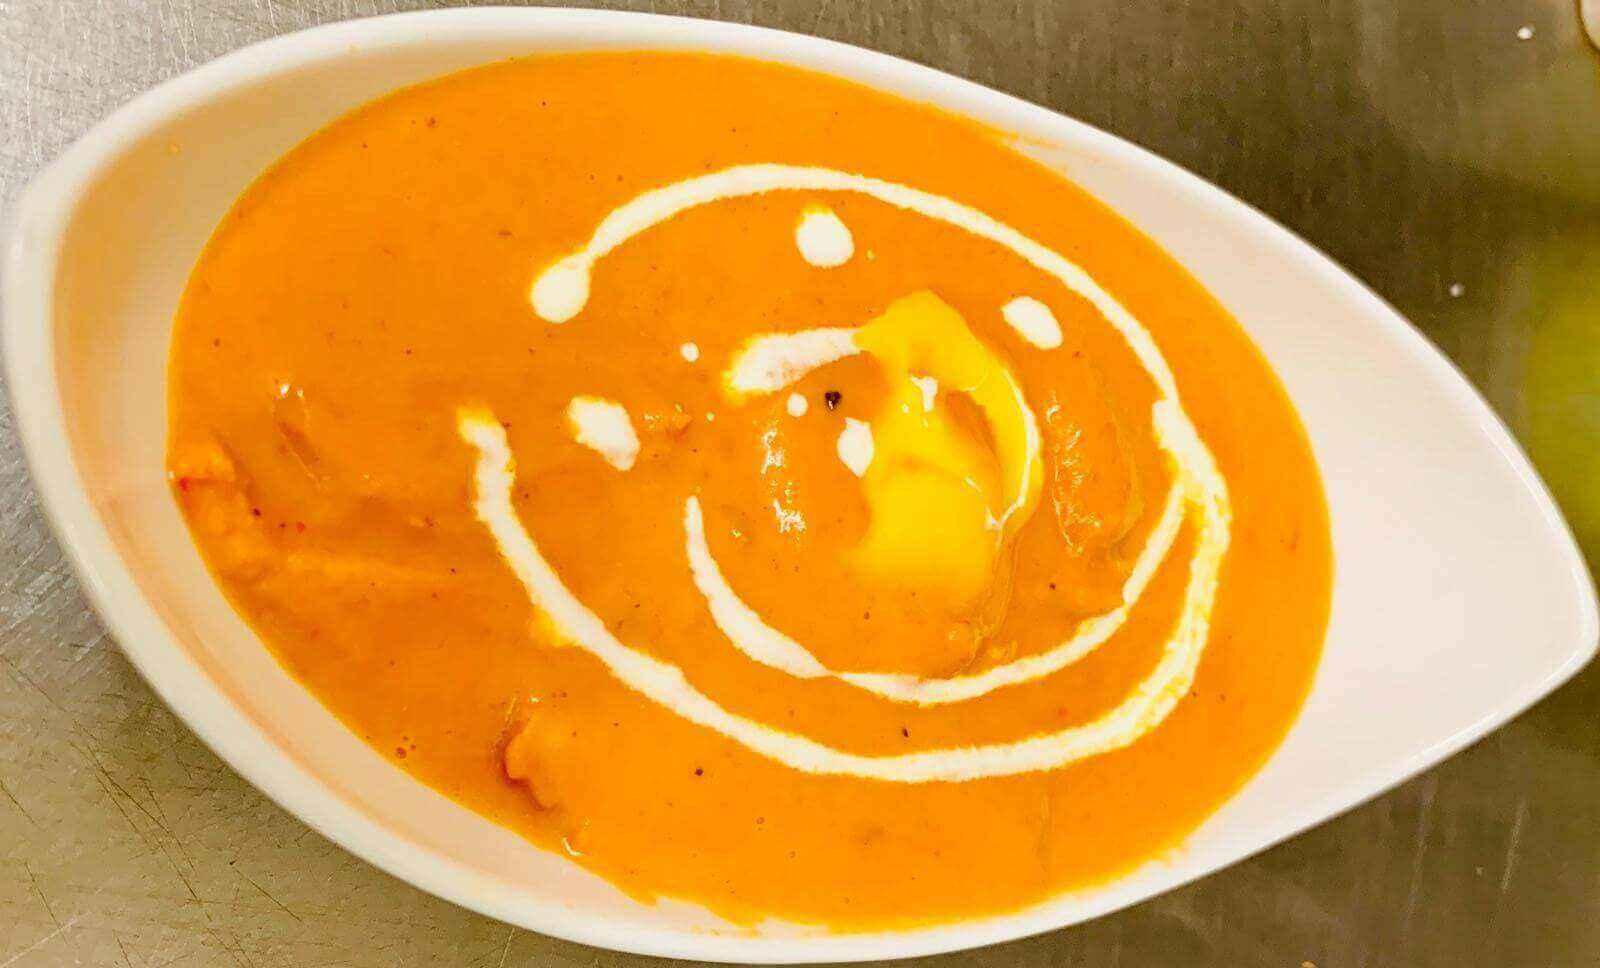 35. Indian food at khans restaurant battersea sw11